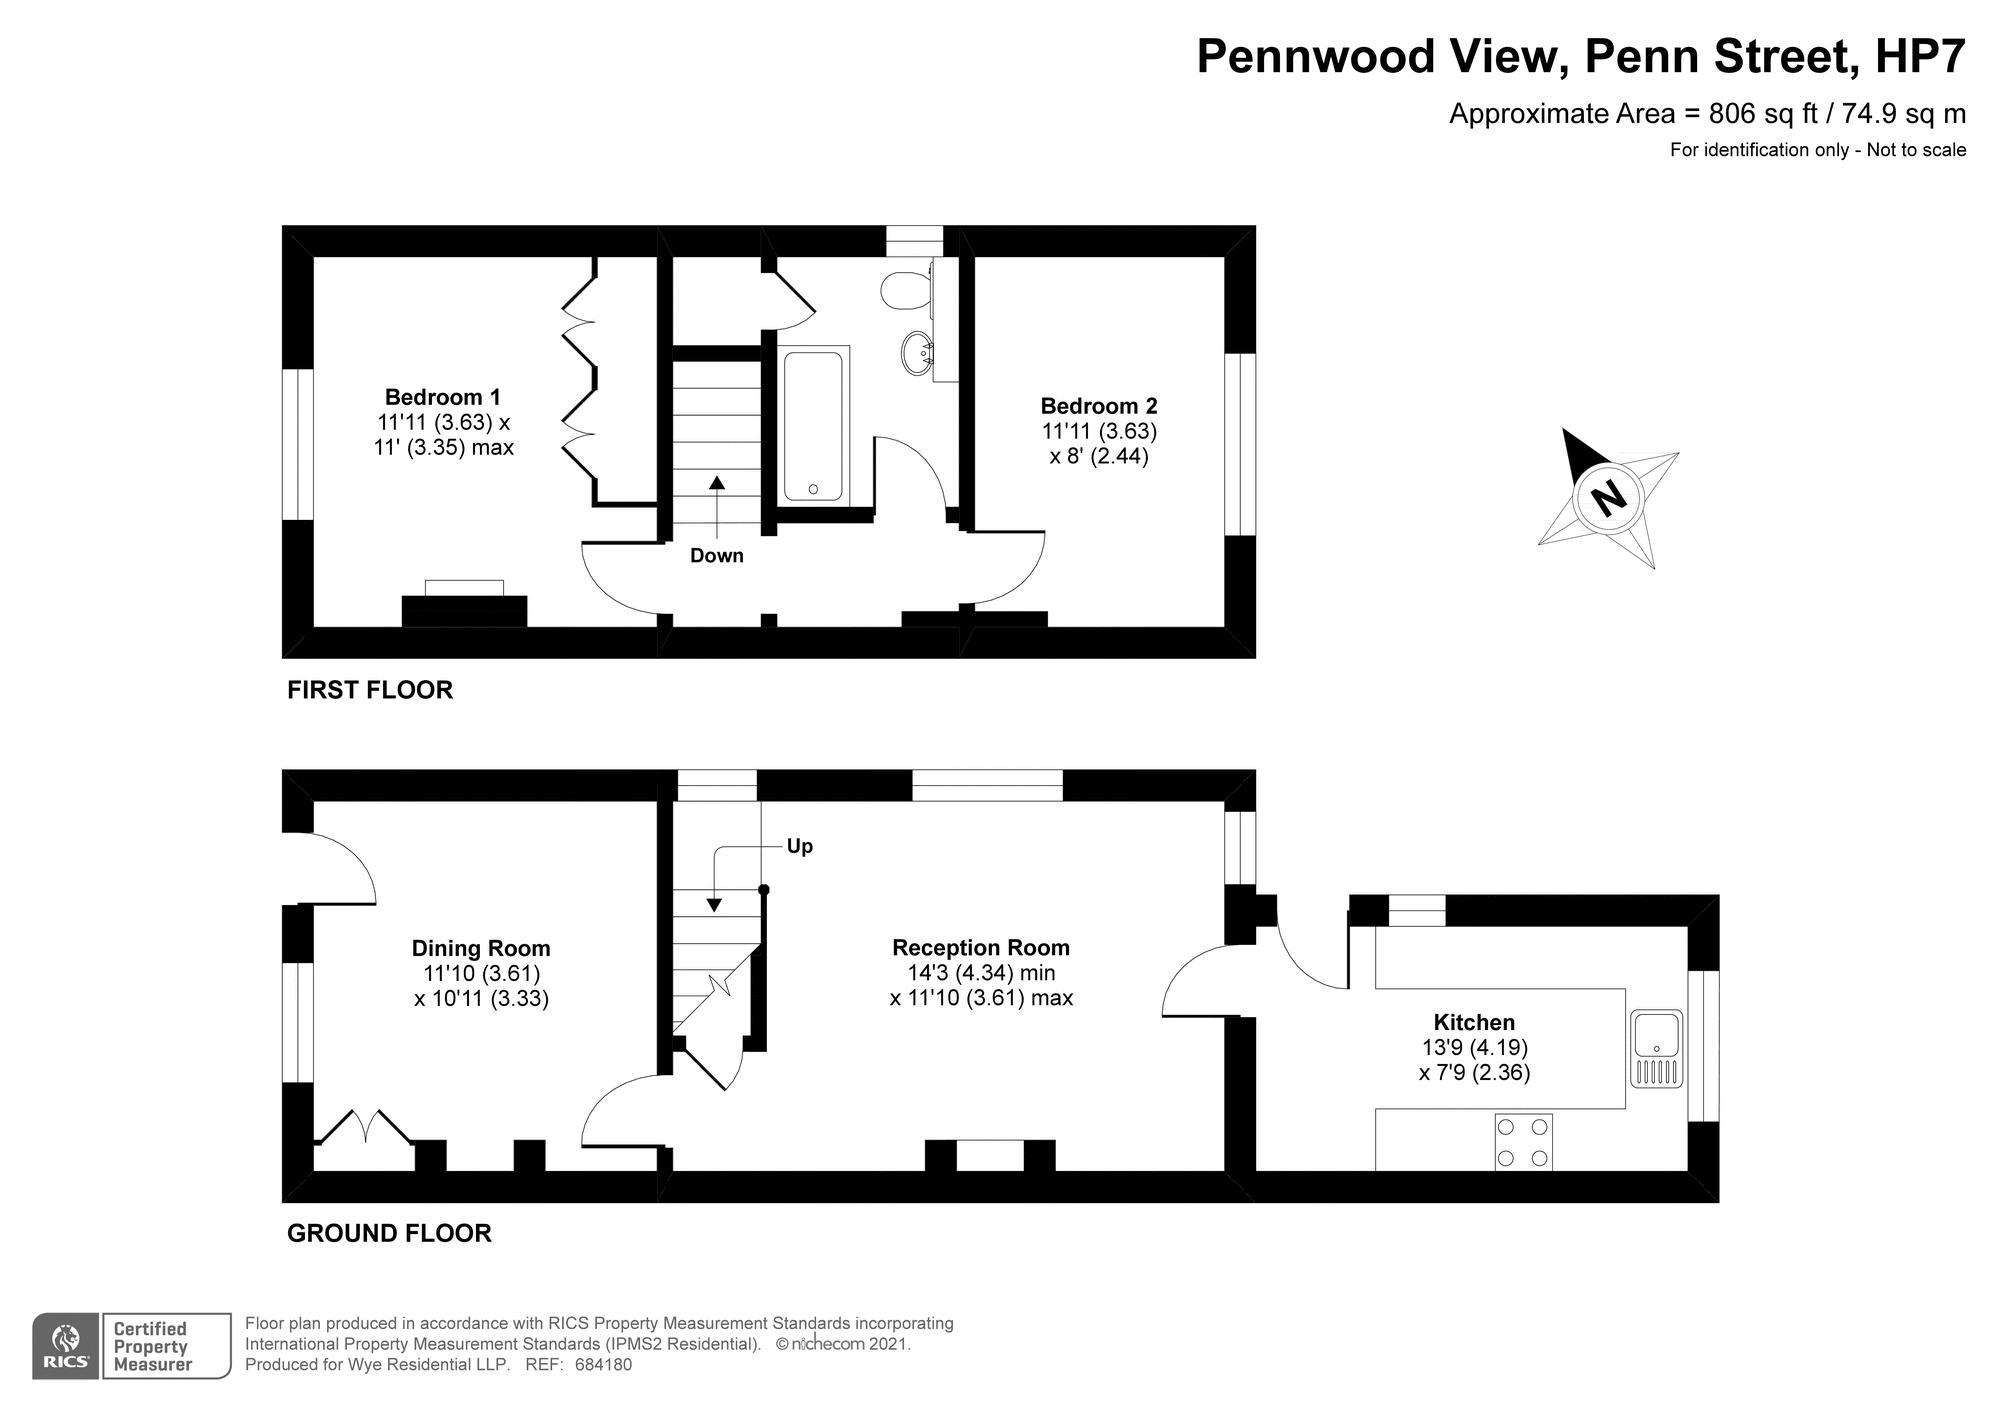 Pennwood View